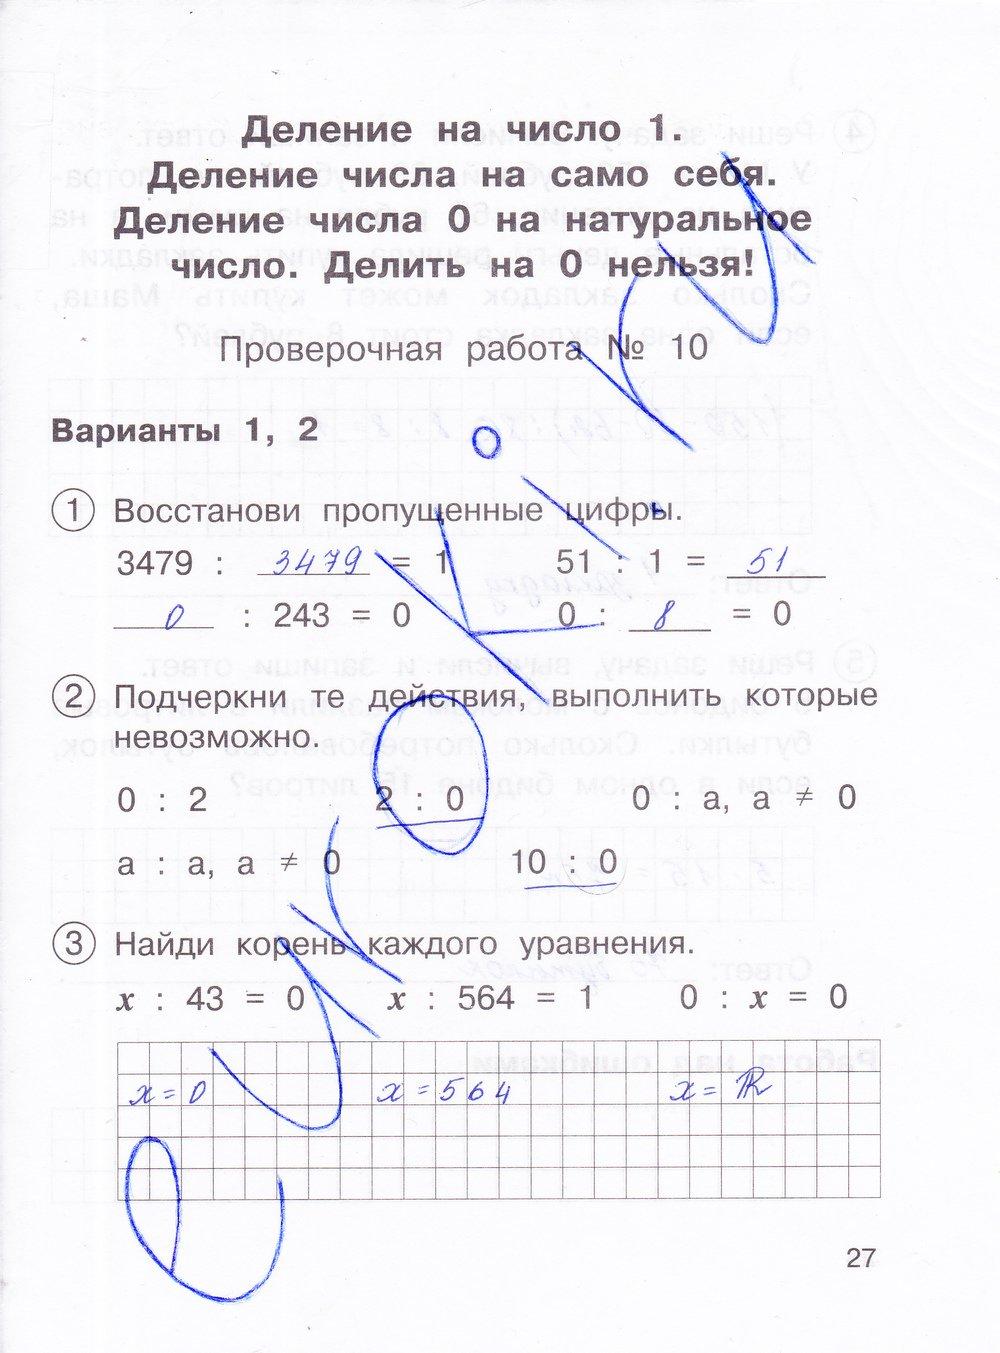 гдз математика 2 класс тетрадь для проверочных работ 1 чуракова